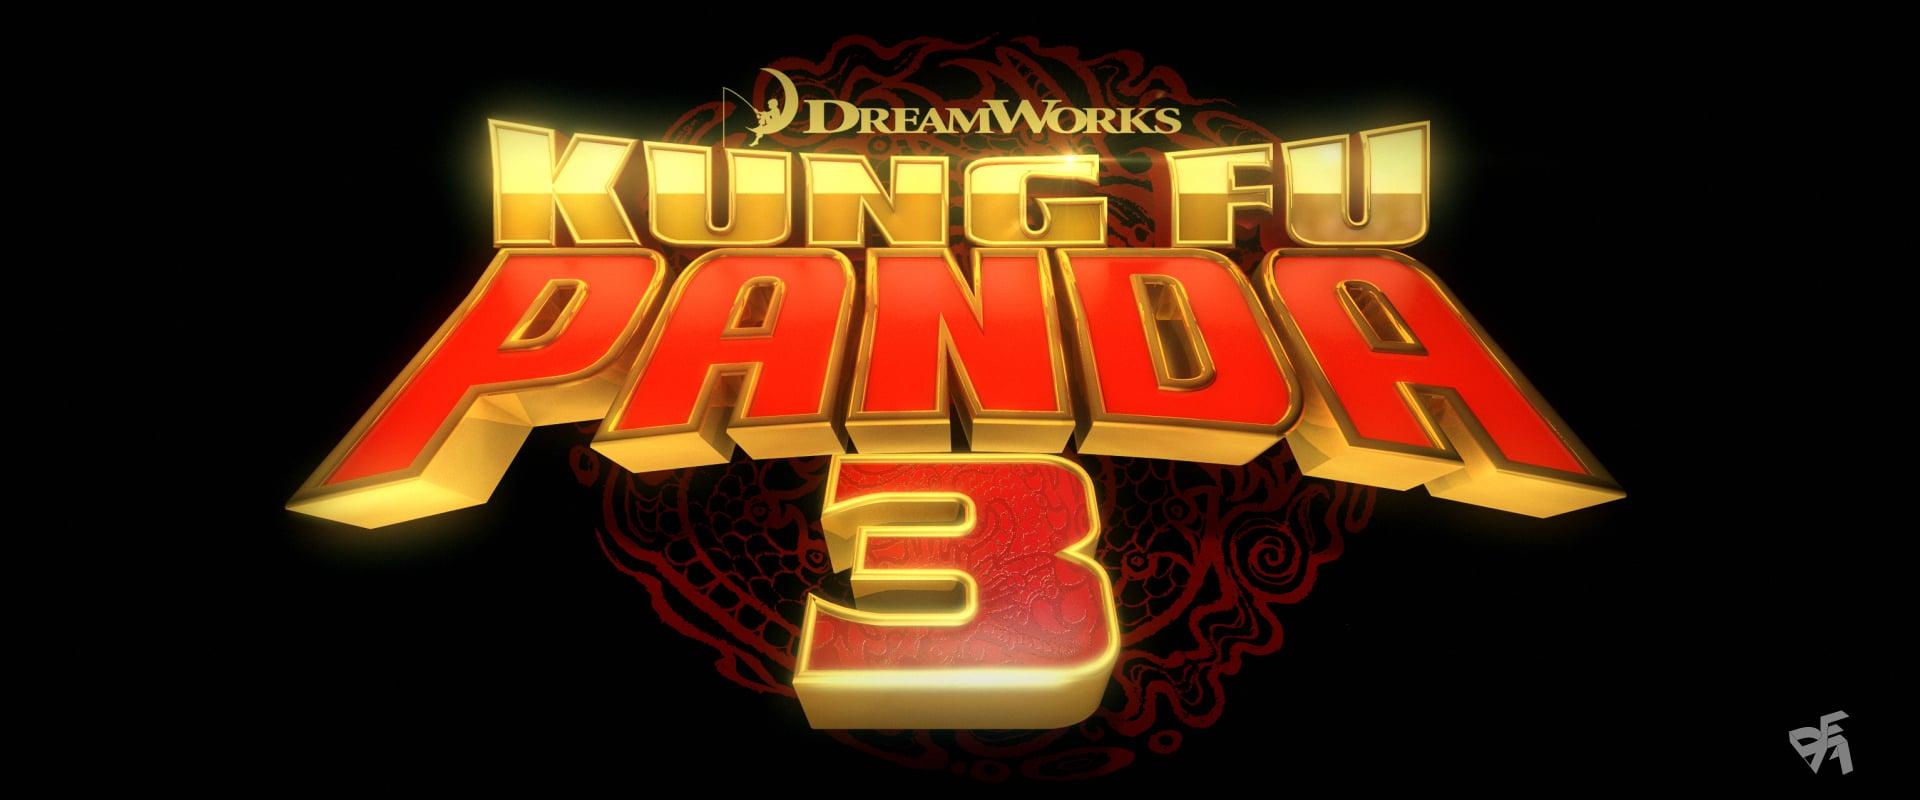 KungFuPanda3-STYLEFRAME_02.jpg